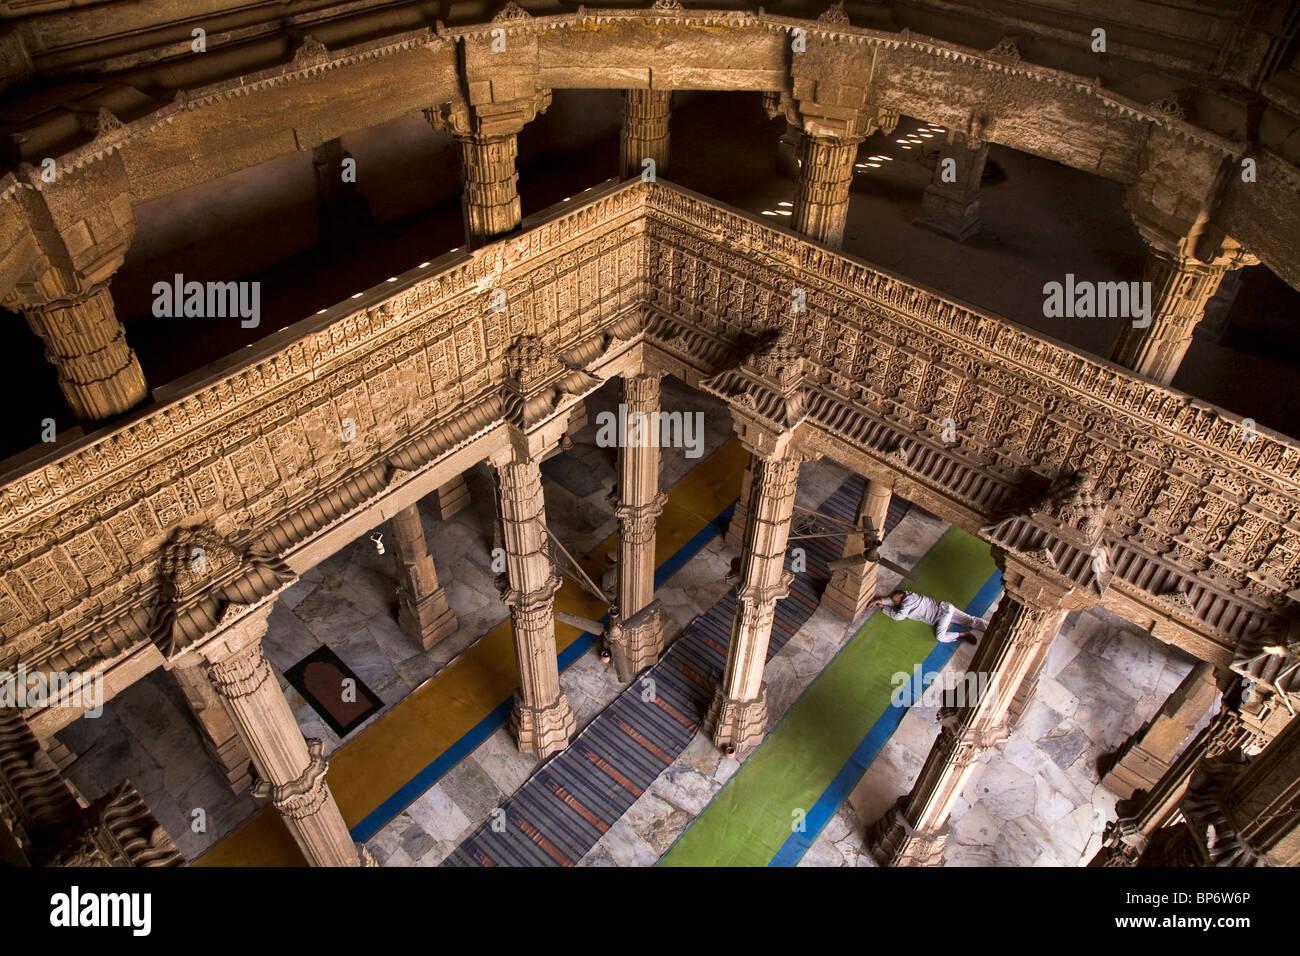 The prayer hall of the Jama Masjid (Friday Mosque) in Ahmedabad, Gujarat, India. - Stock Image